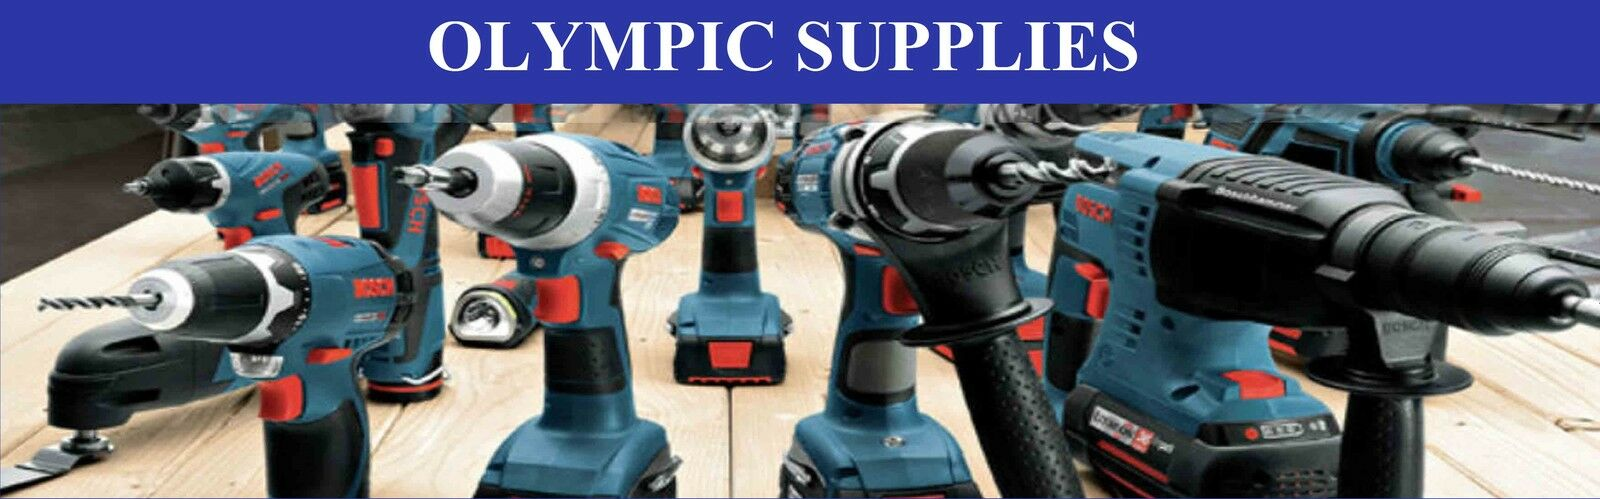 olympicsupplies2014